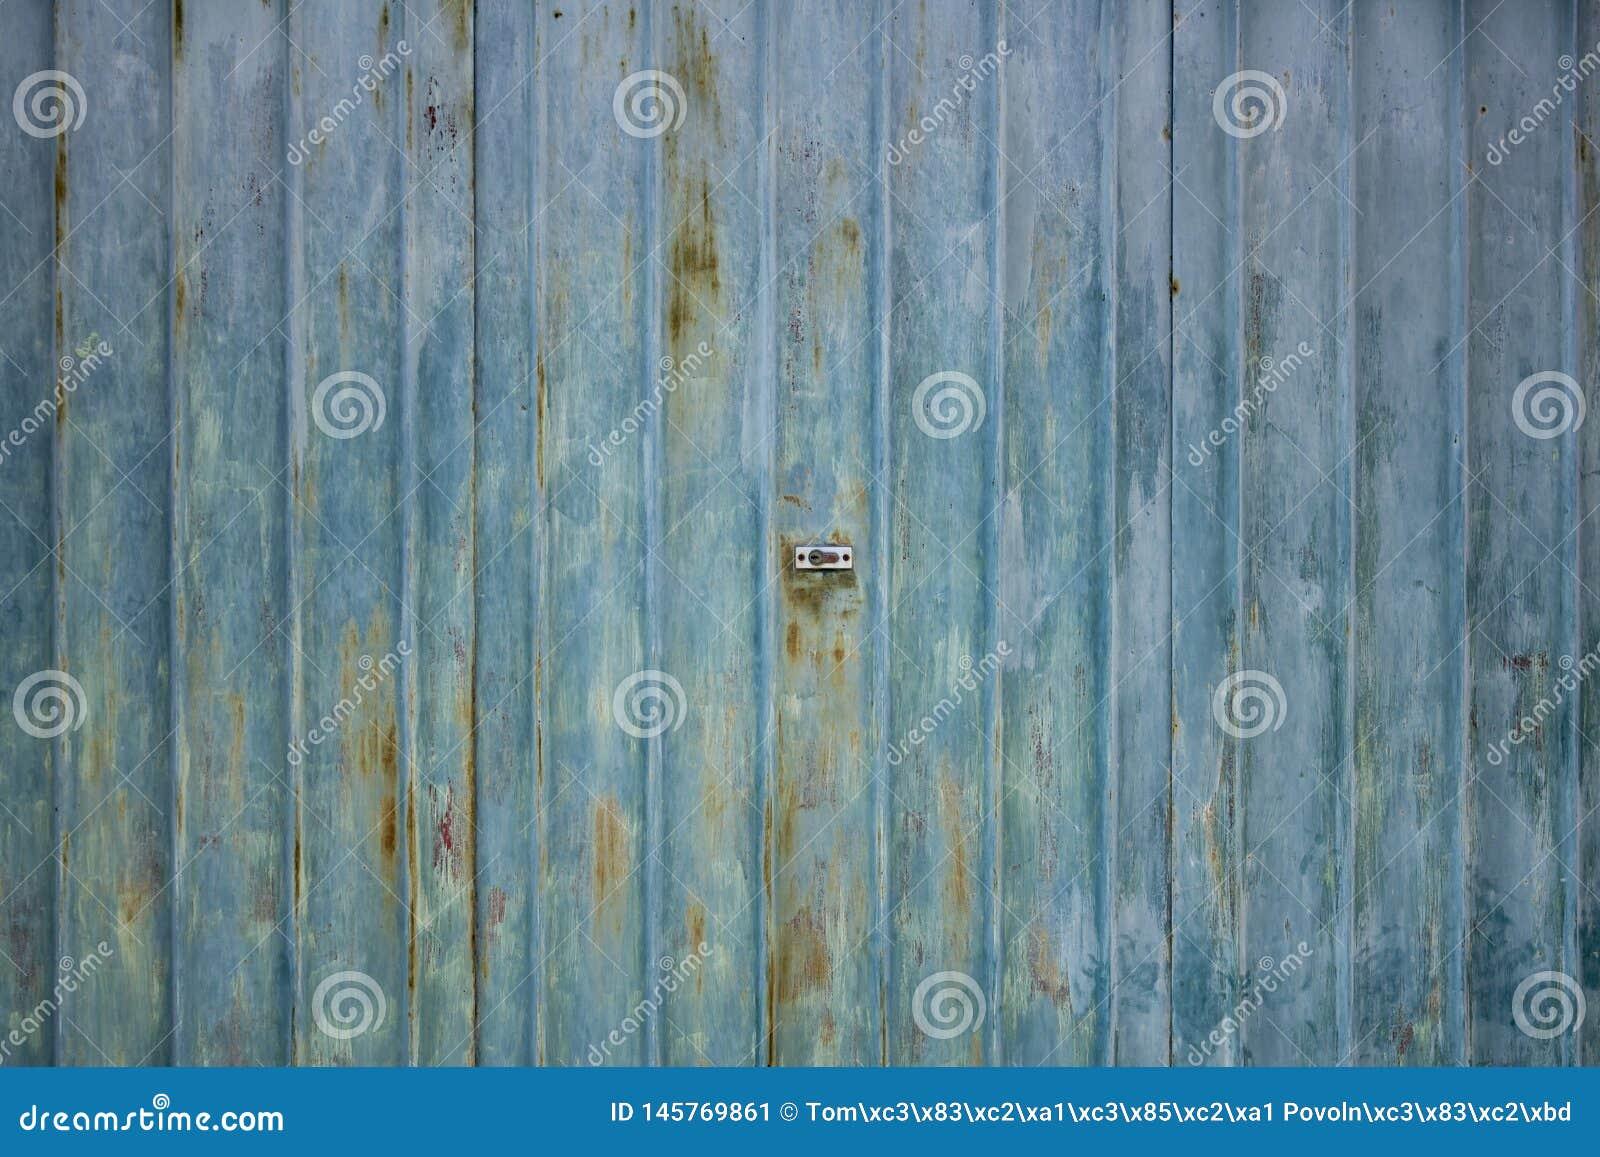 Corrugated rusty metal garage doors texture with lock in center